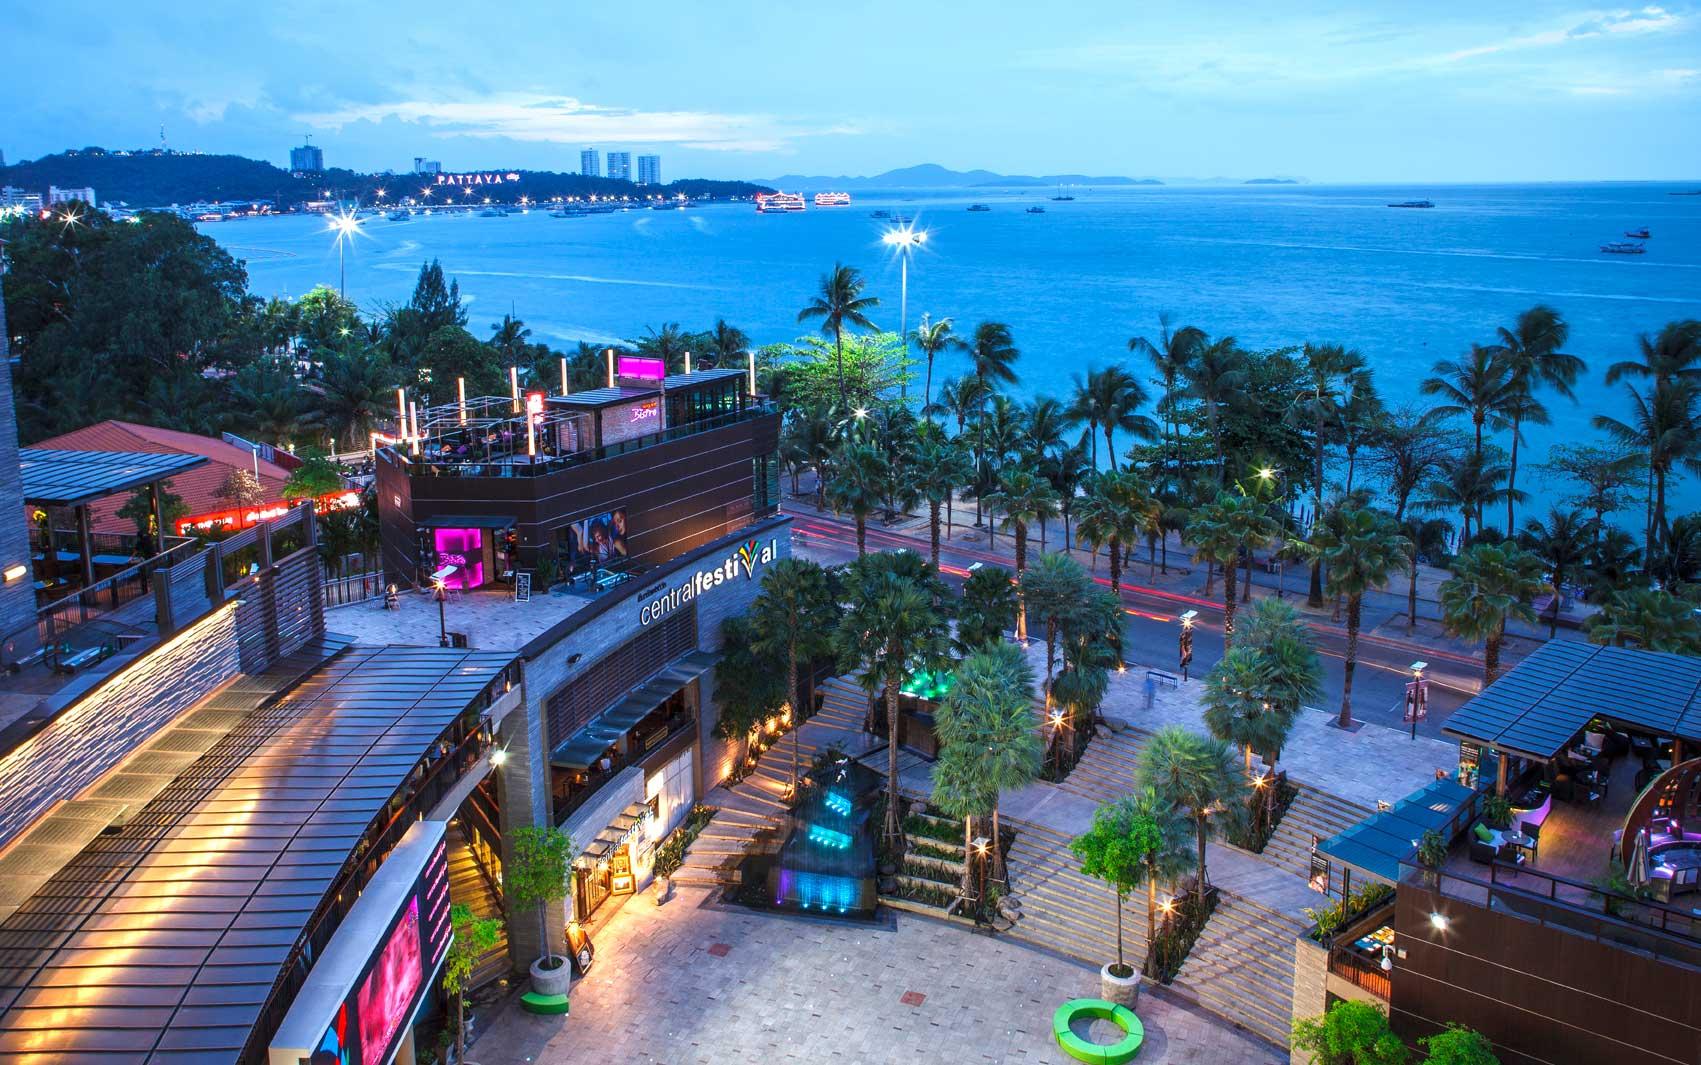 Central Festival Pattaya Beach